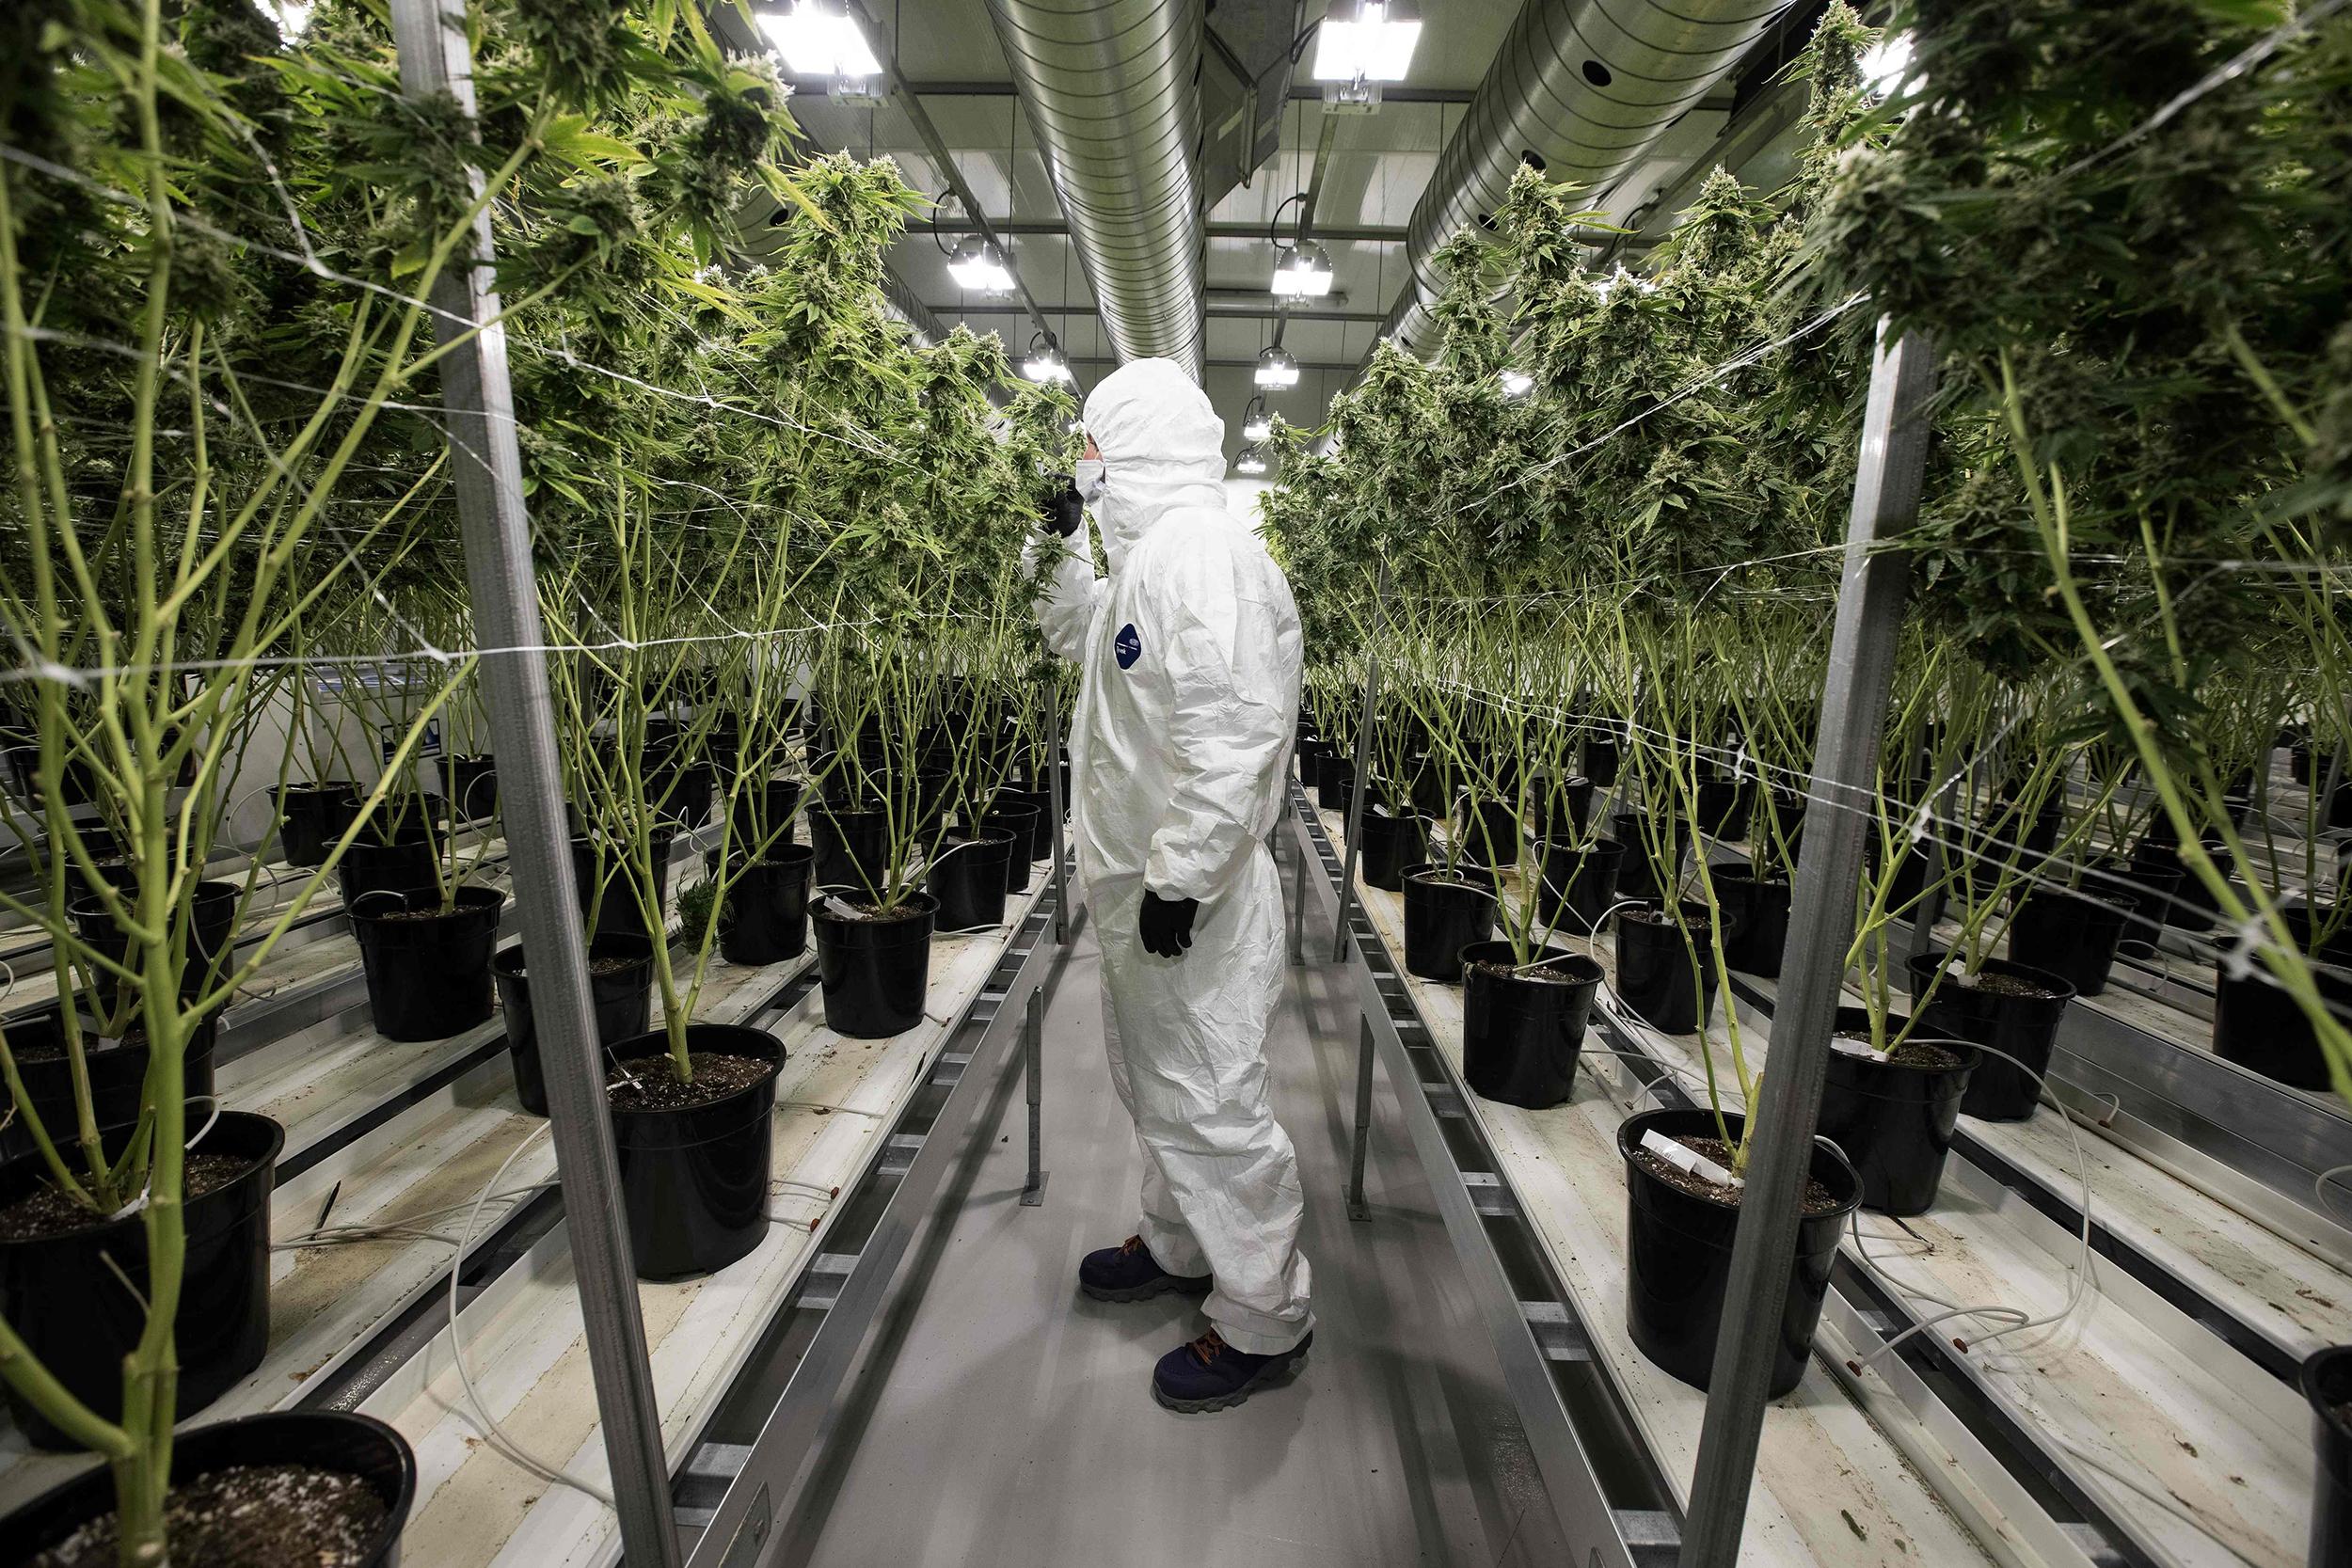 Canada's Senate passes marijuana bill but legalization delayed